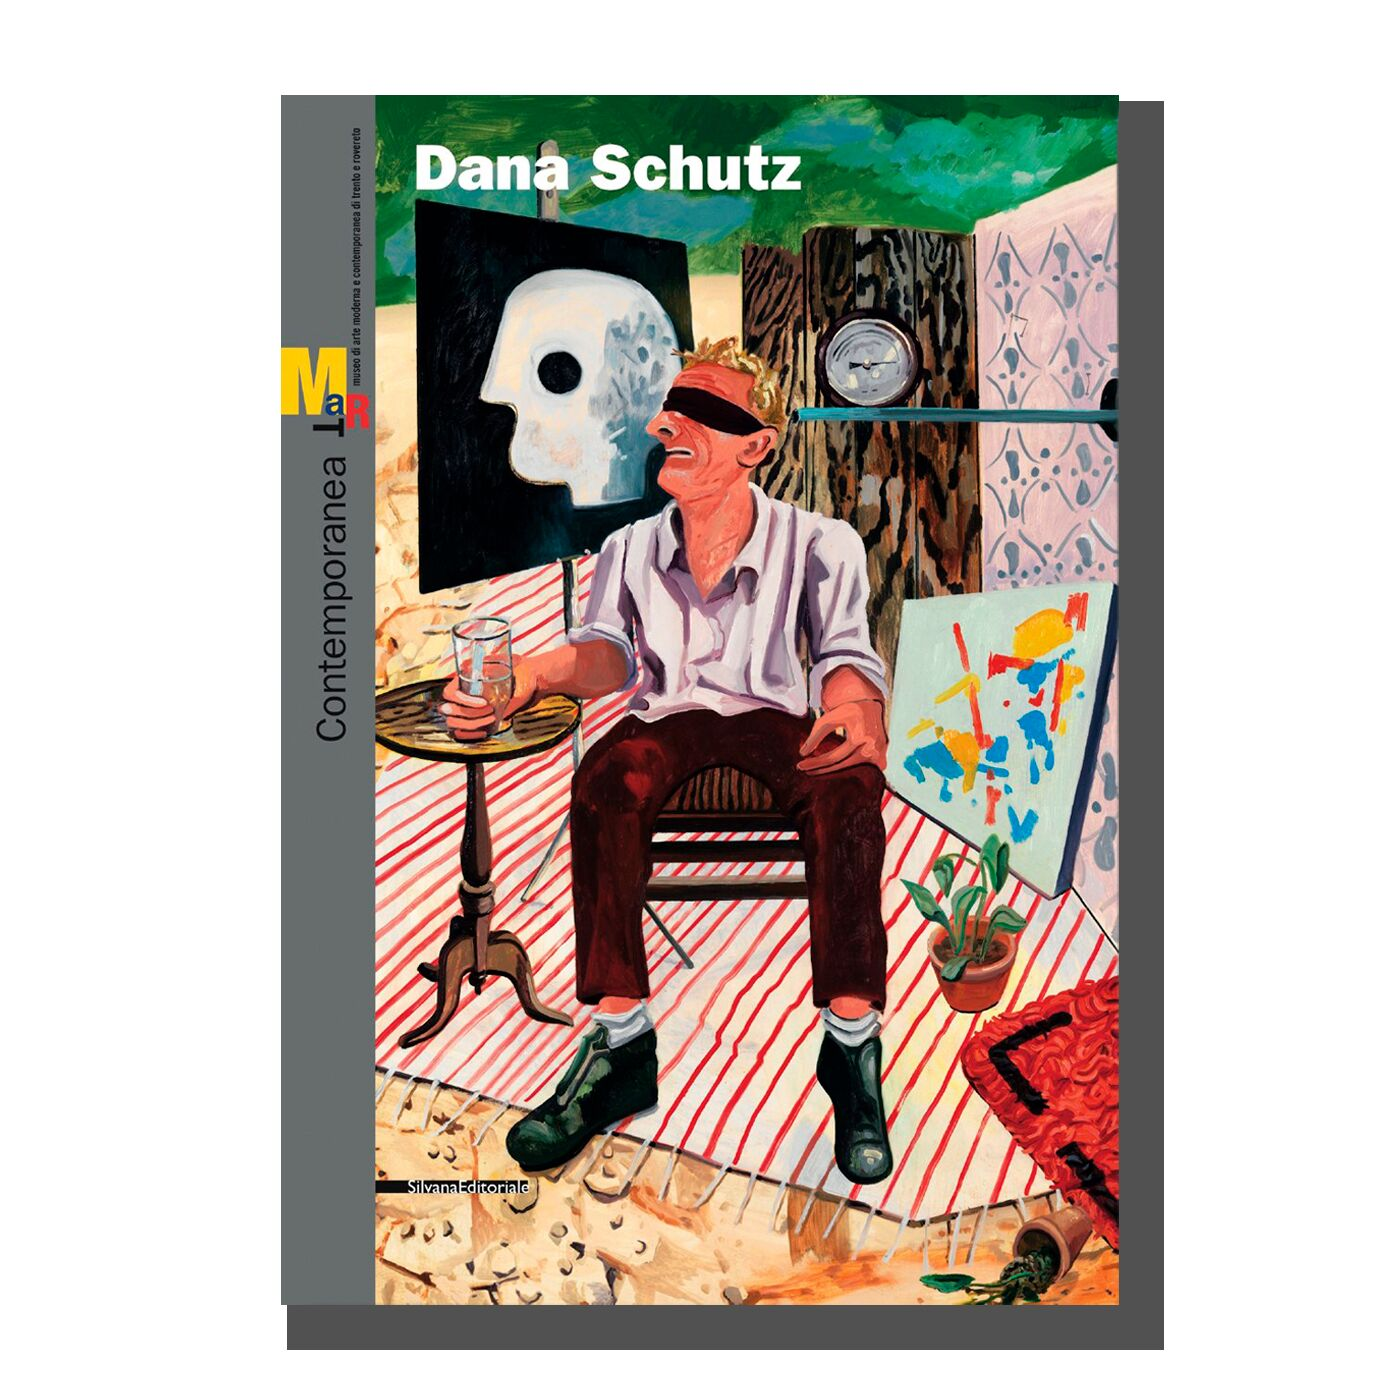 Dana Schutz: Young in the Future